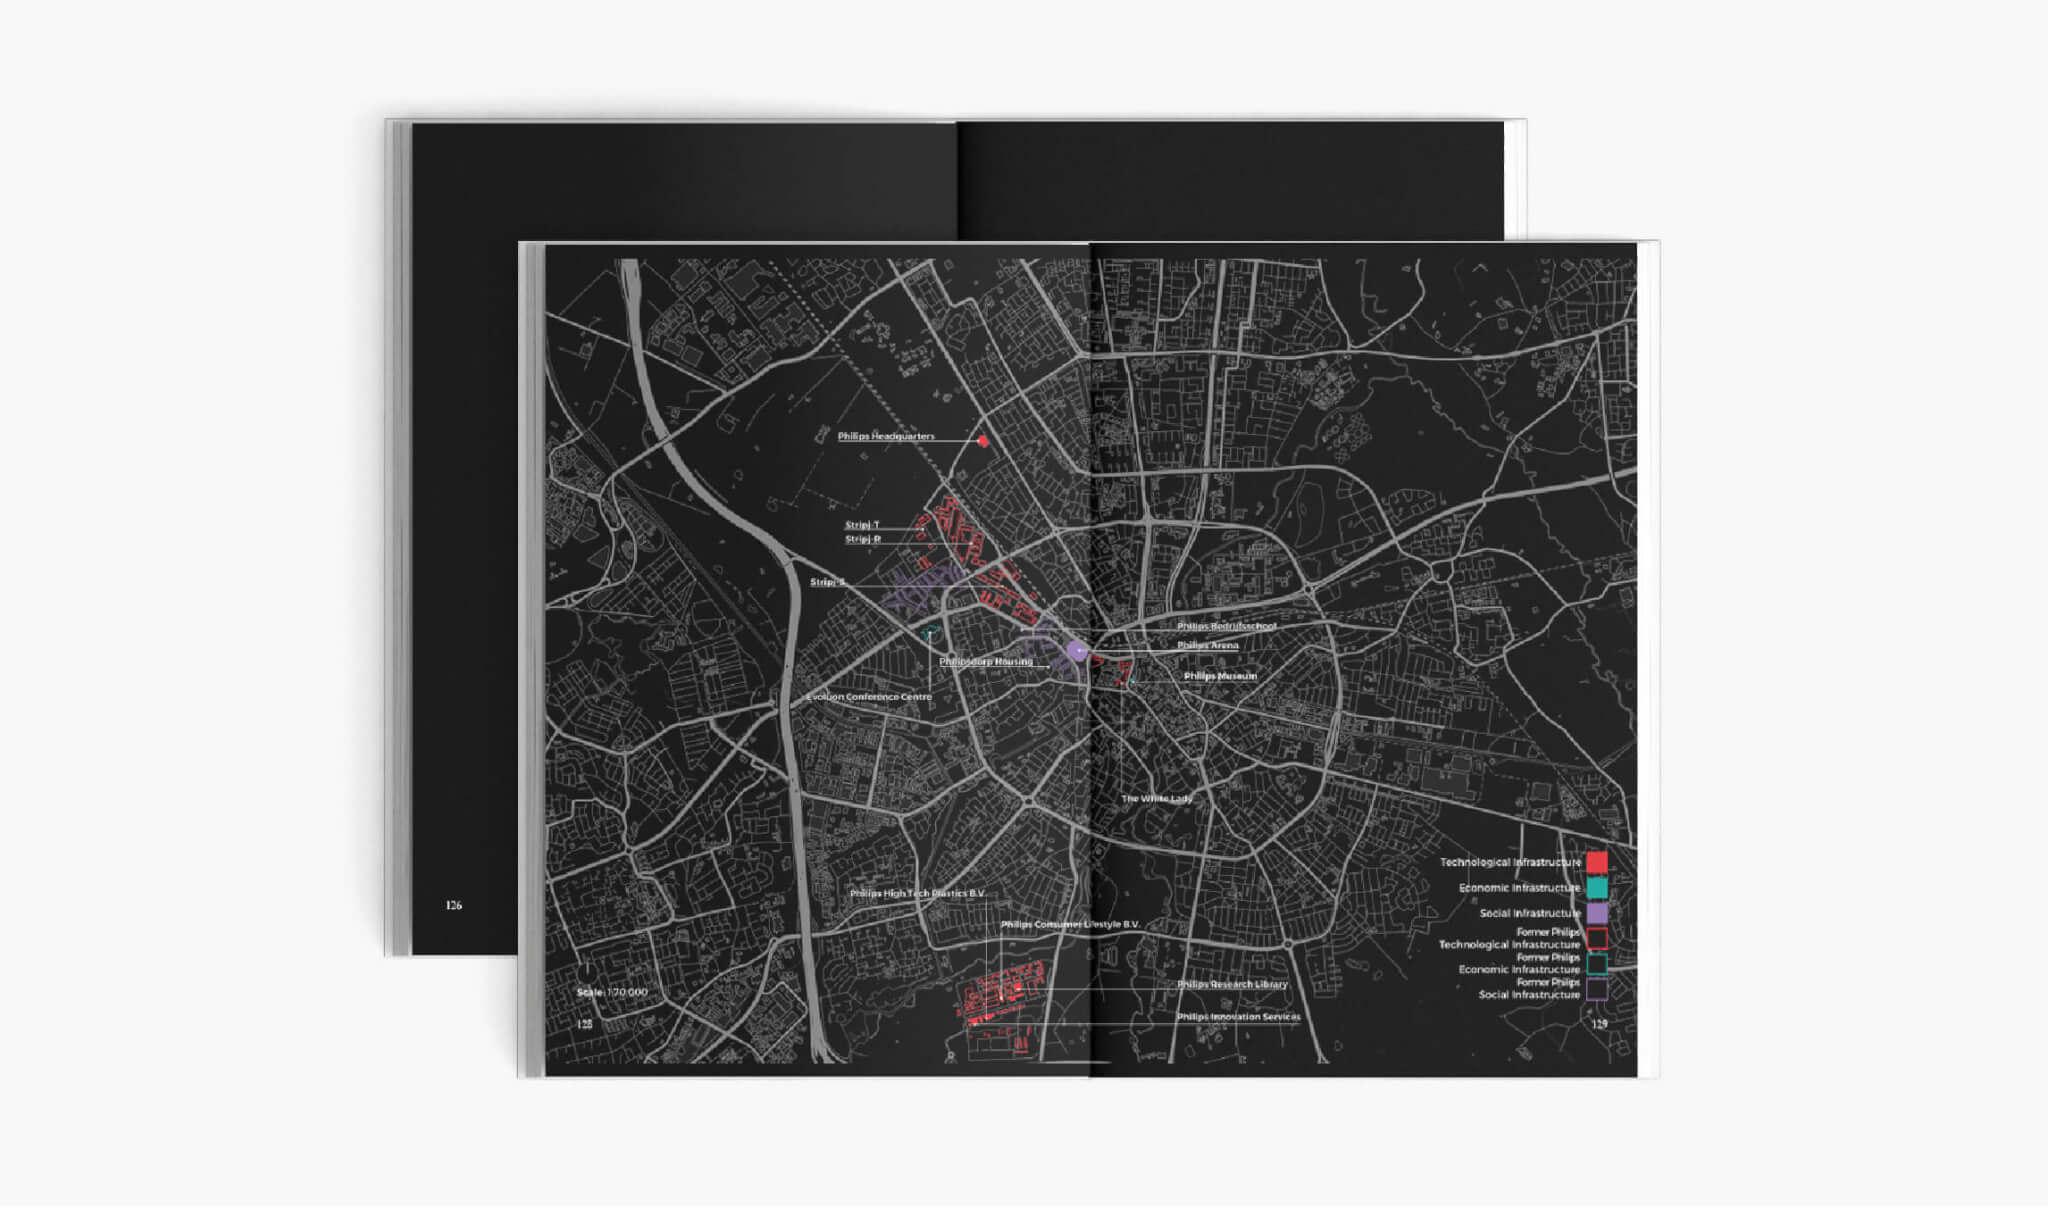 studio-interrobang-corporate-landscapes-mapping17